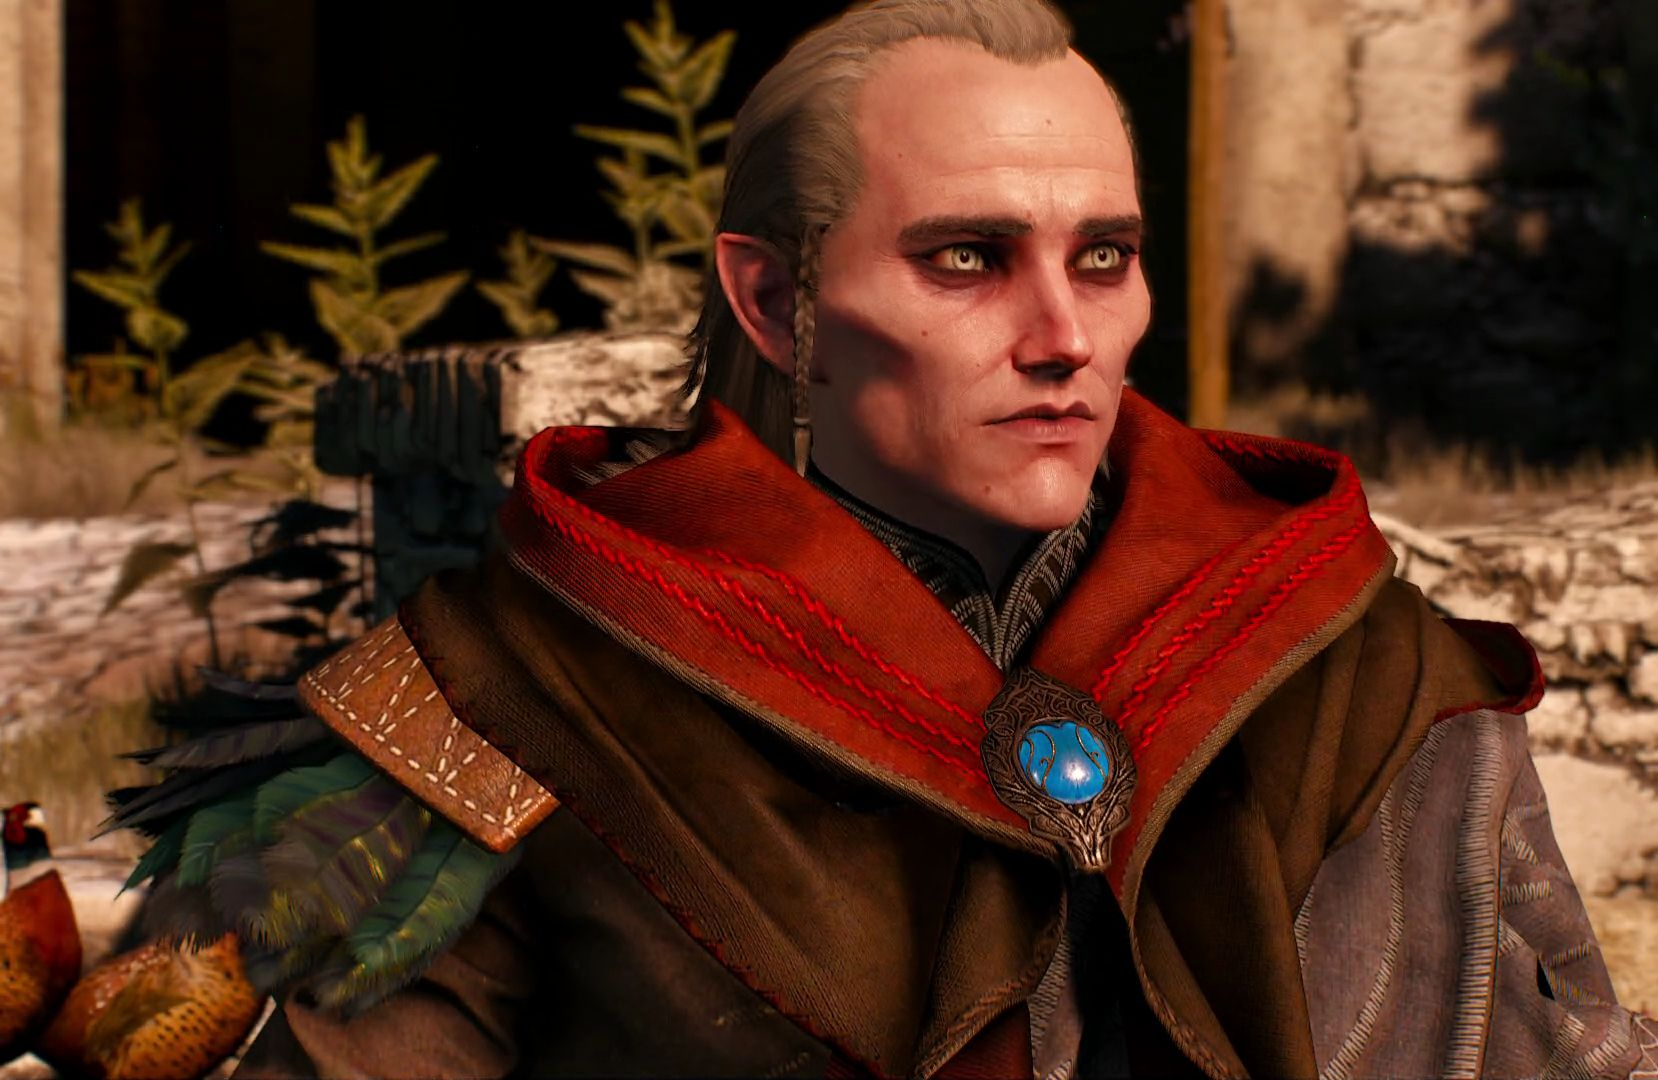 Who Do You Ship With Avallac H More Ciri Or Lara Dorren The Witcher V 2020 G